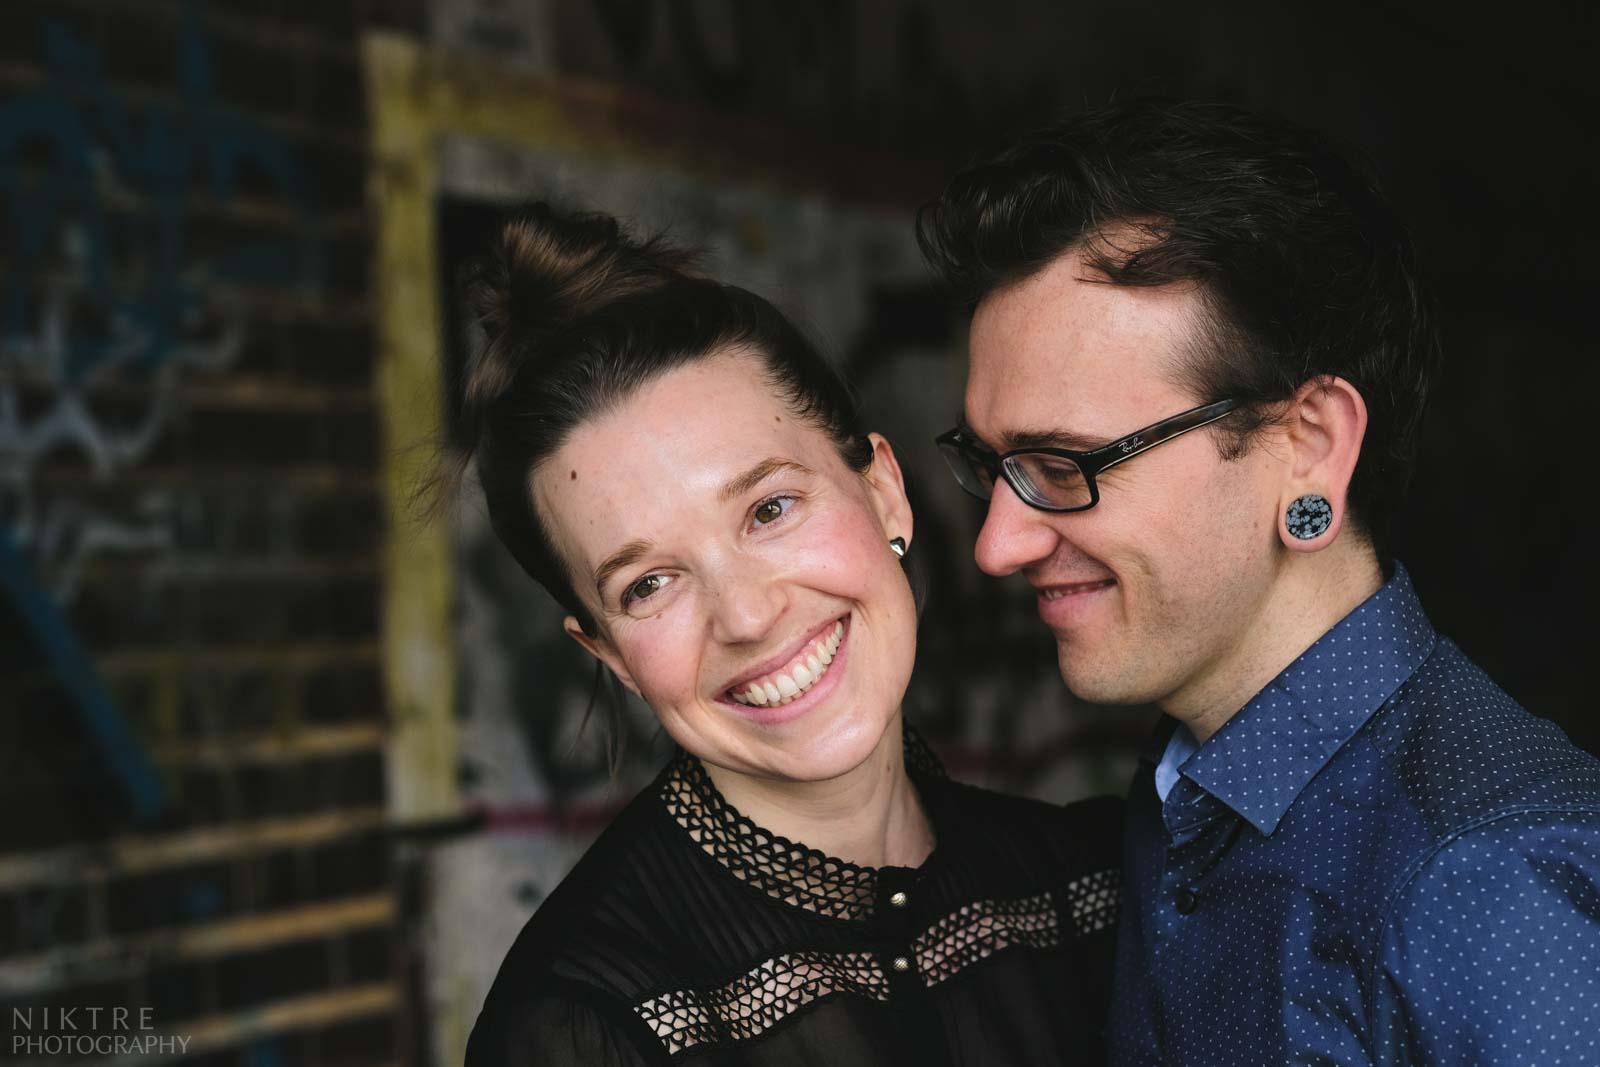 Paar lächelt während eines Fotoshootings